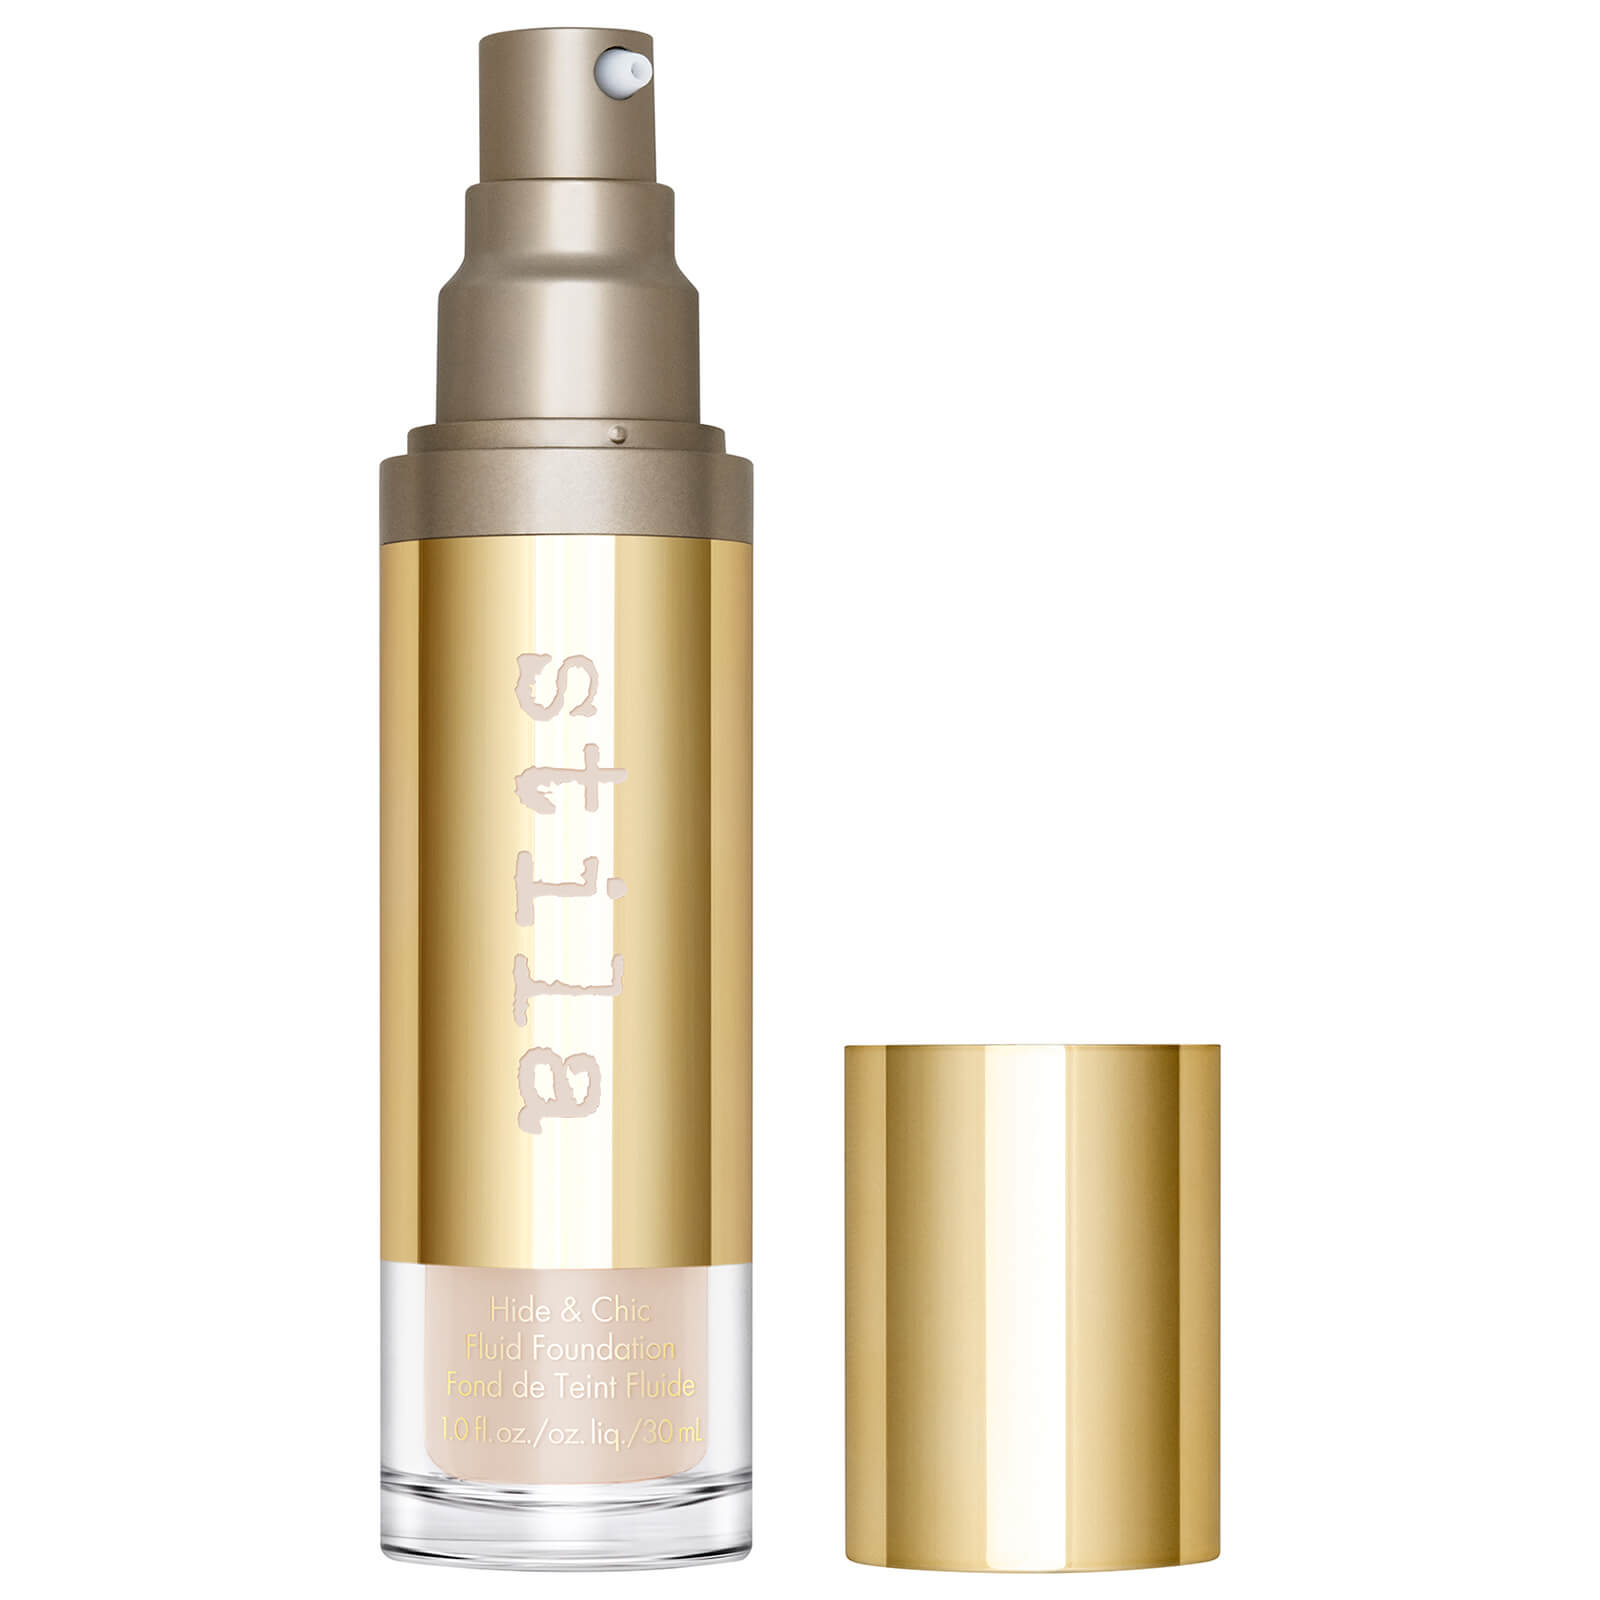 Купить Stila Hide and Chic Fluid Foundation 30ml (Various Shades) - Light 2